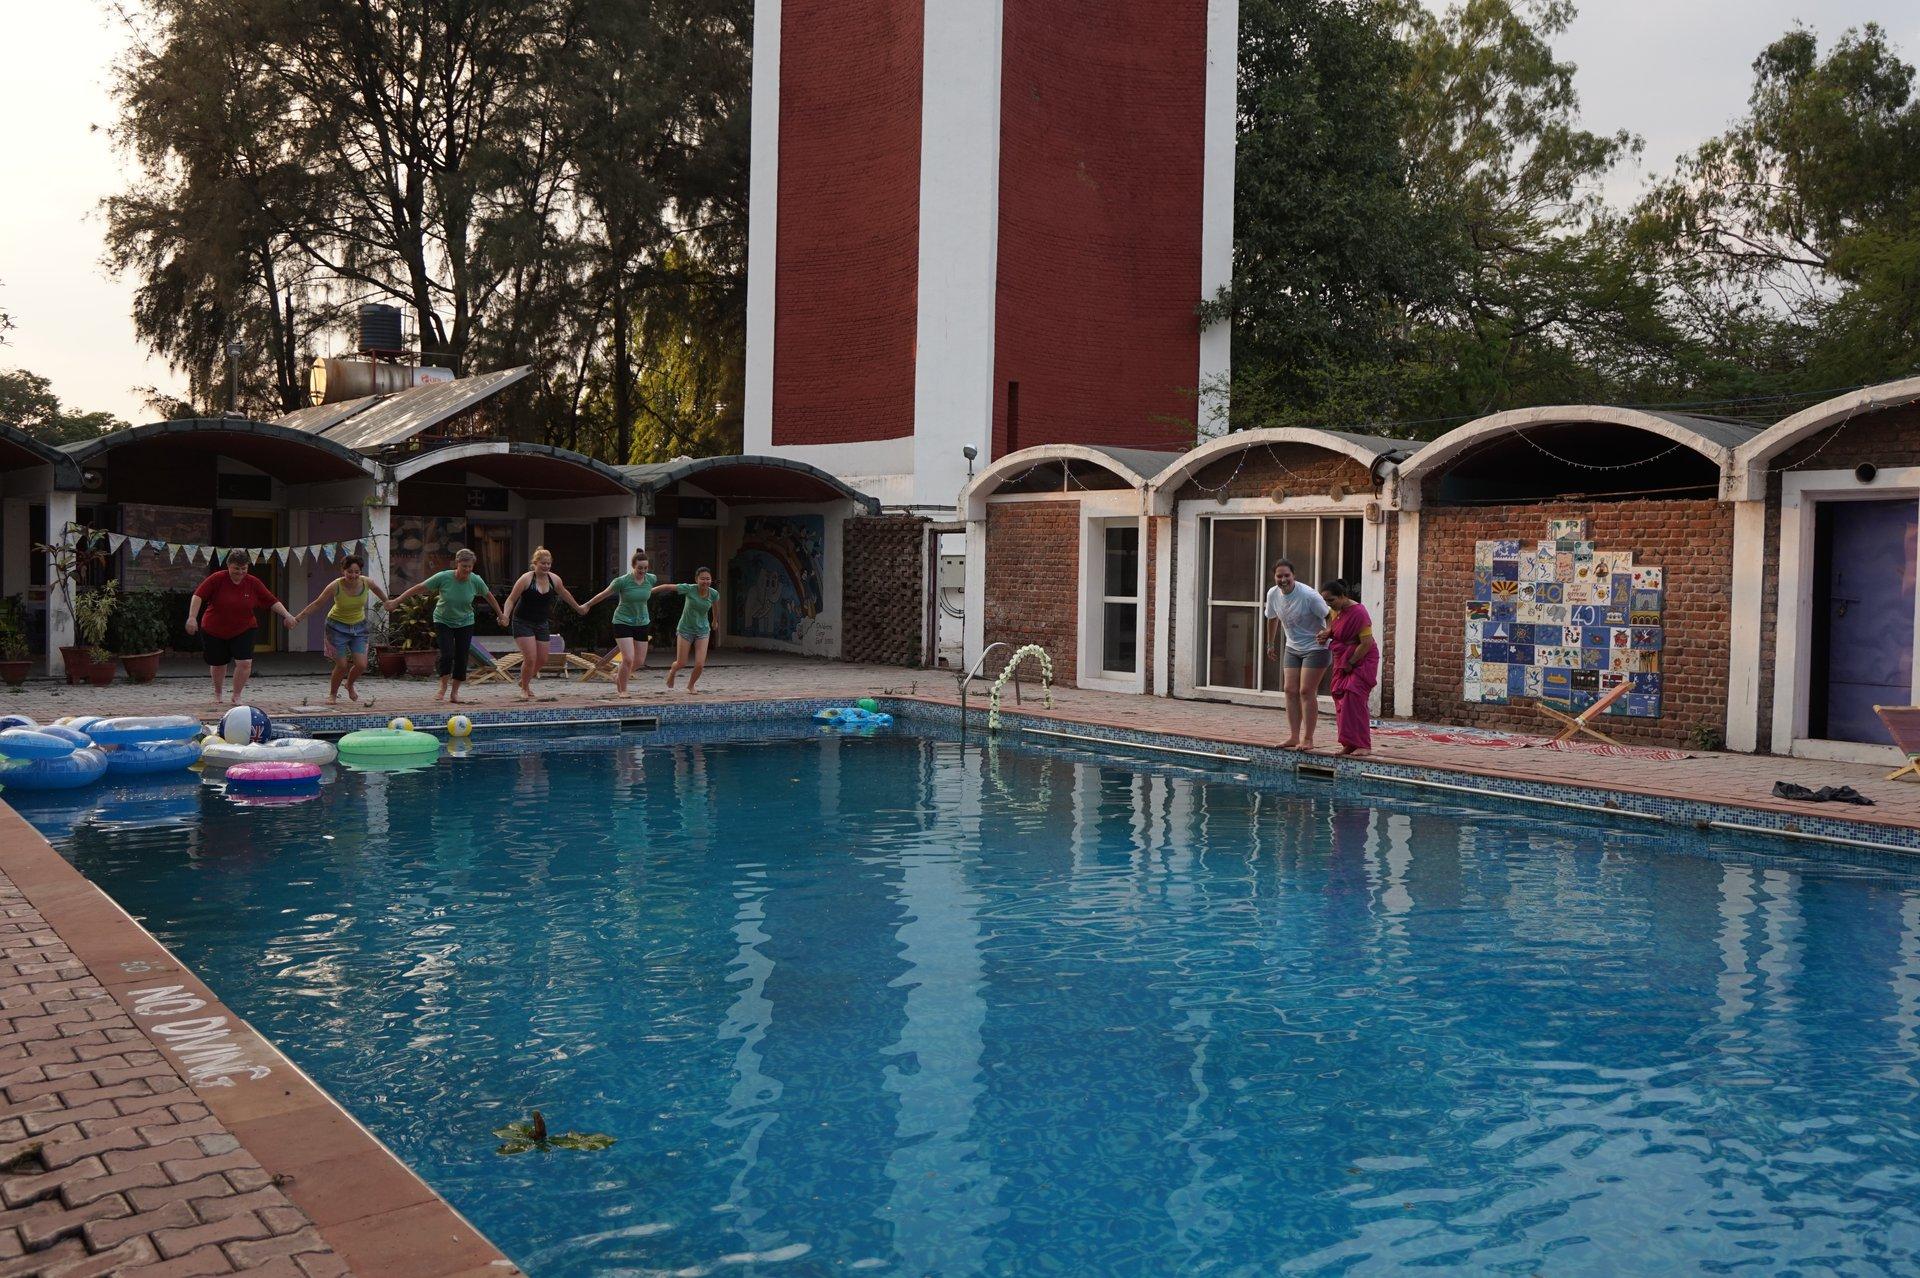 092015_Sangam_Old pool